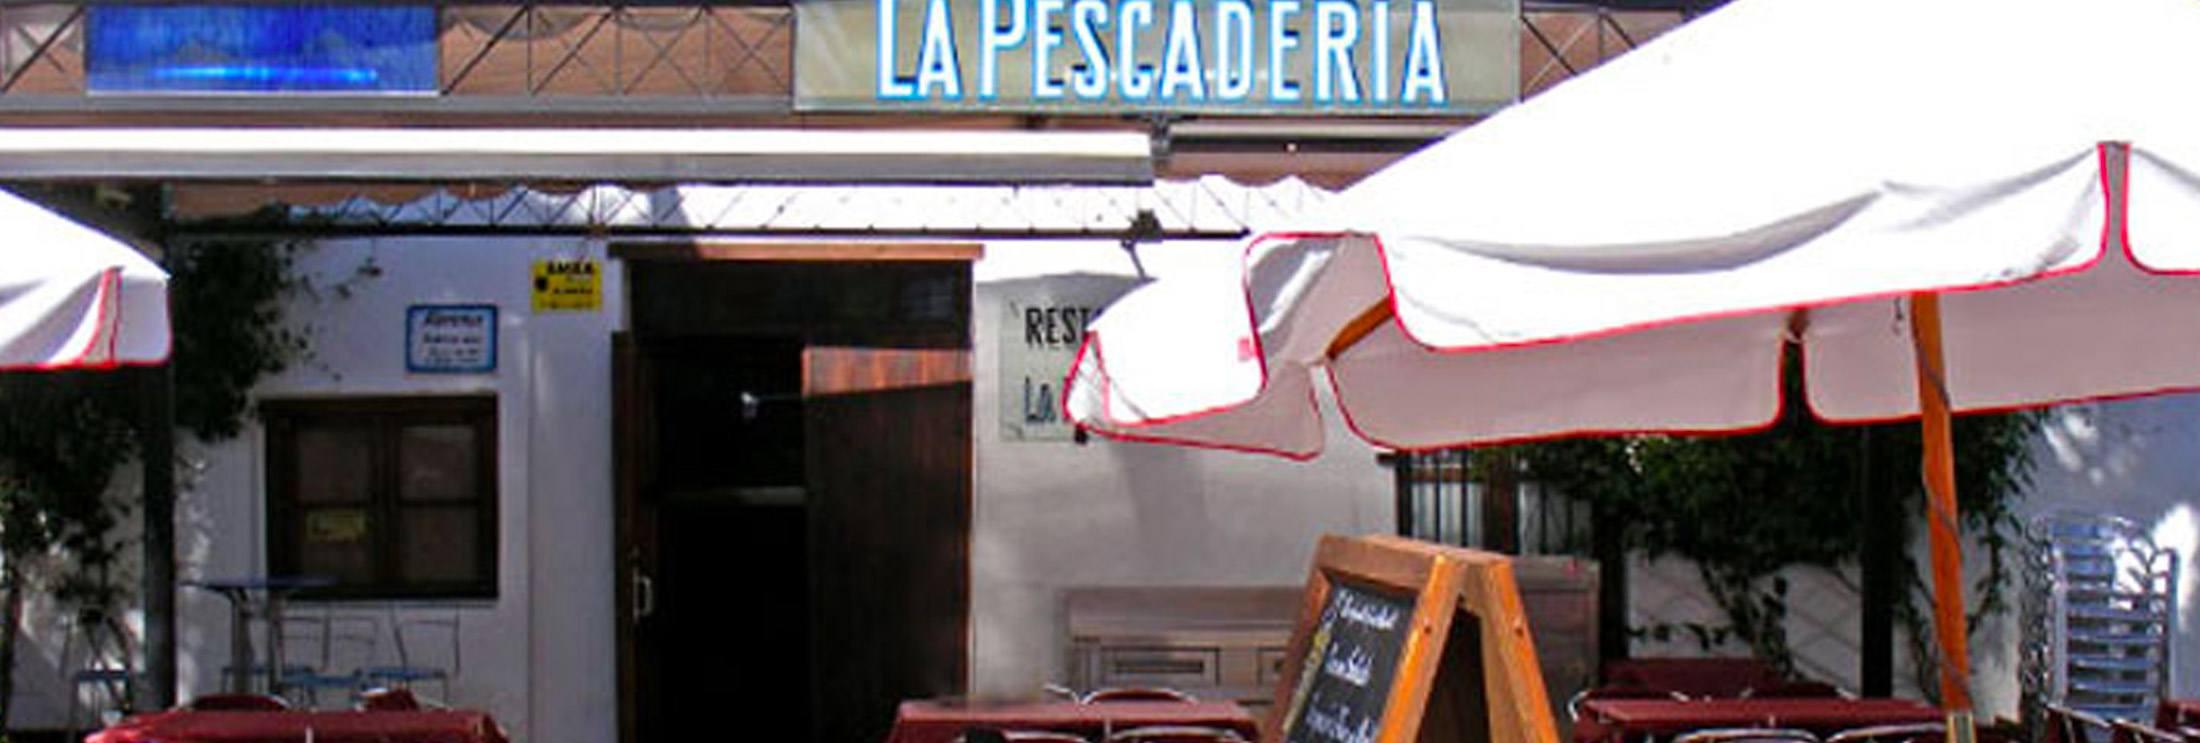 La-Pescaderia-Andalousian-SeaFood-Restaurants-Tarifa-fresh Tuna